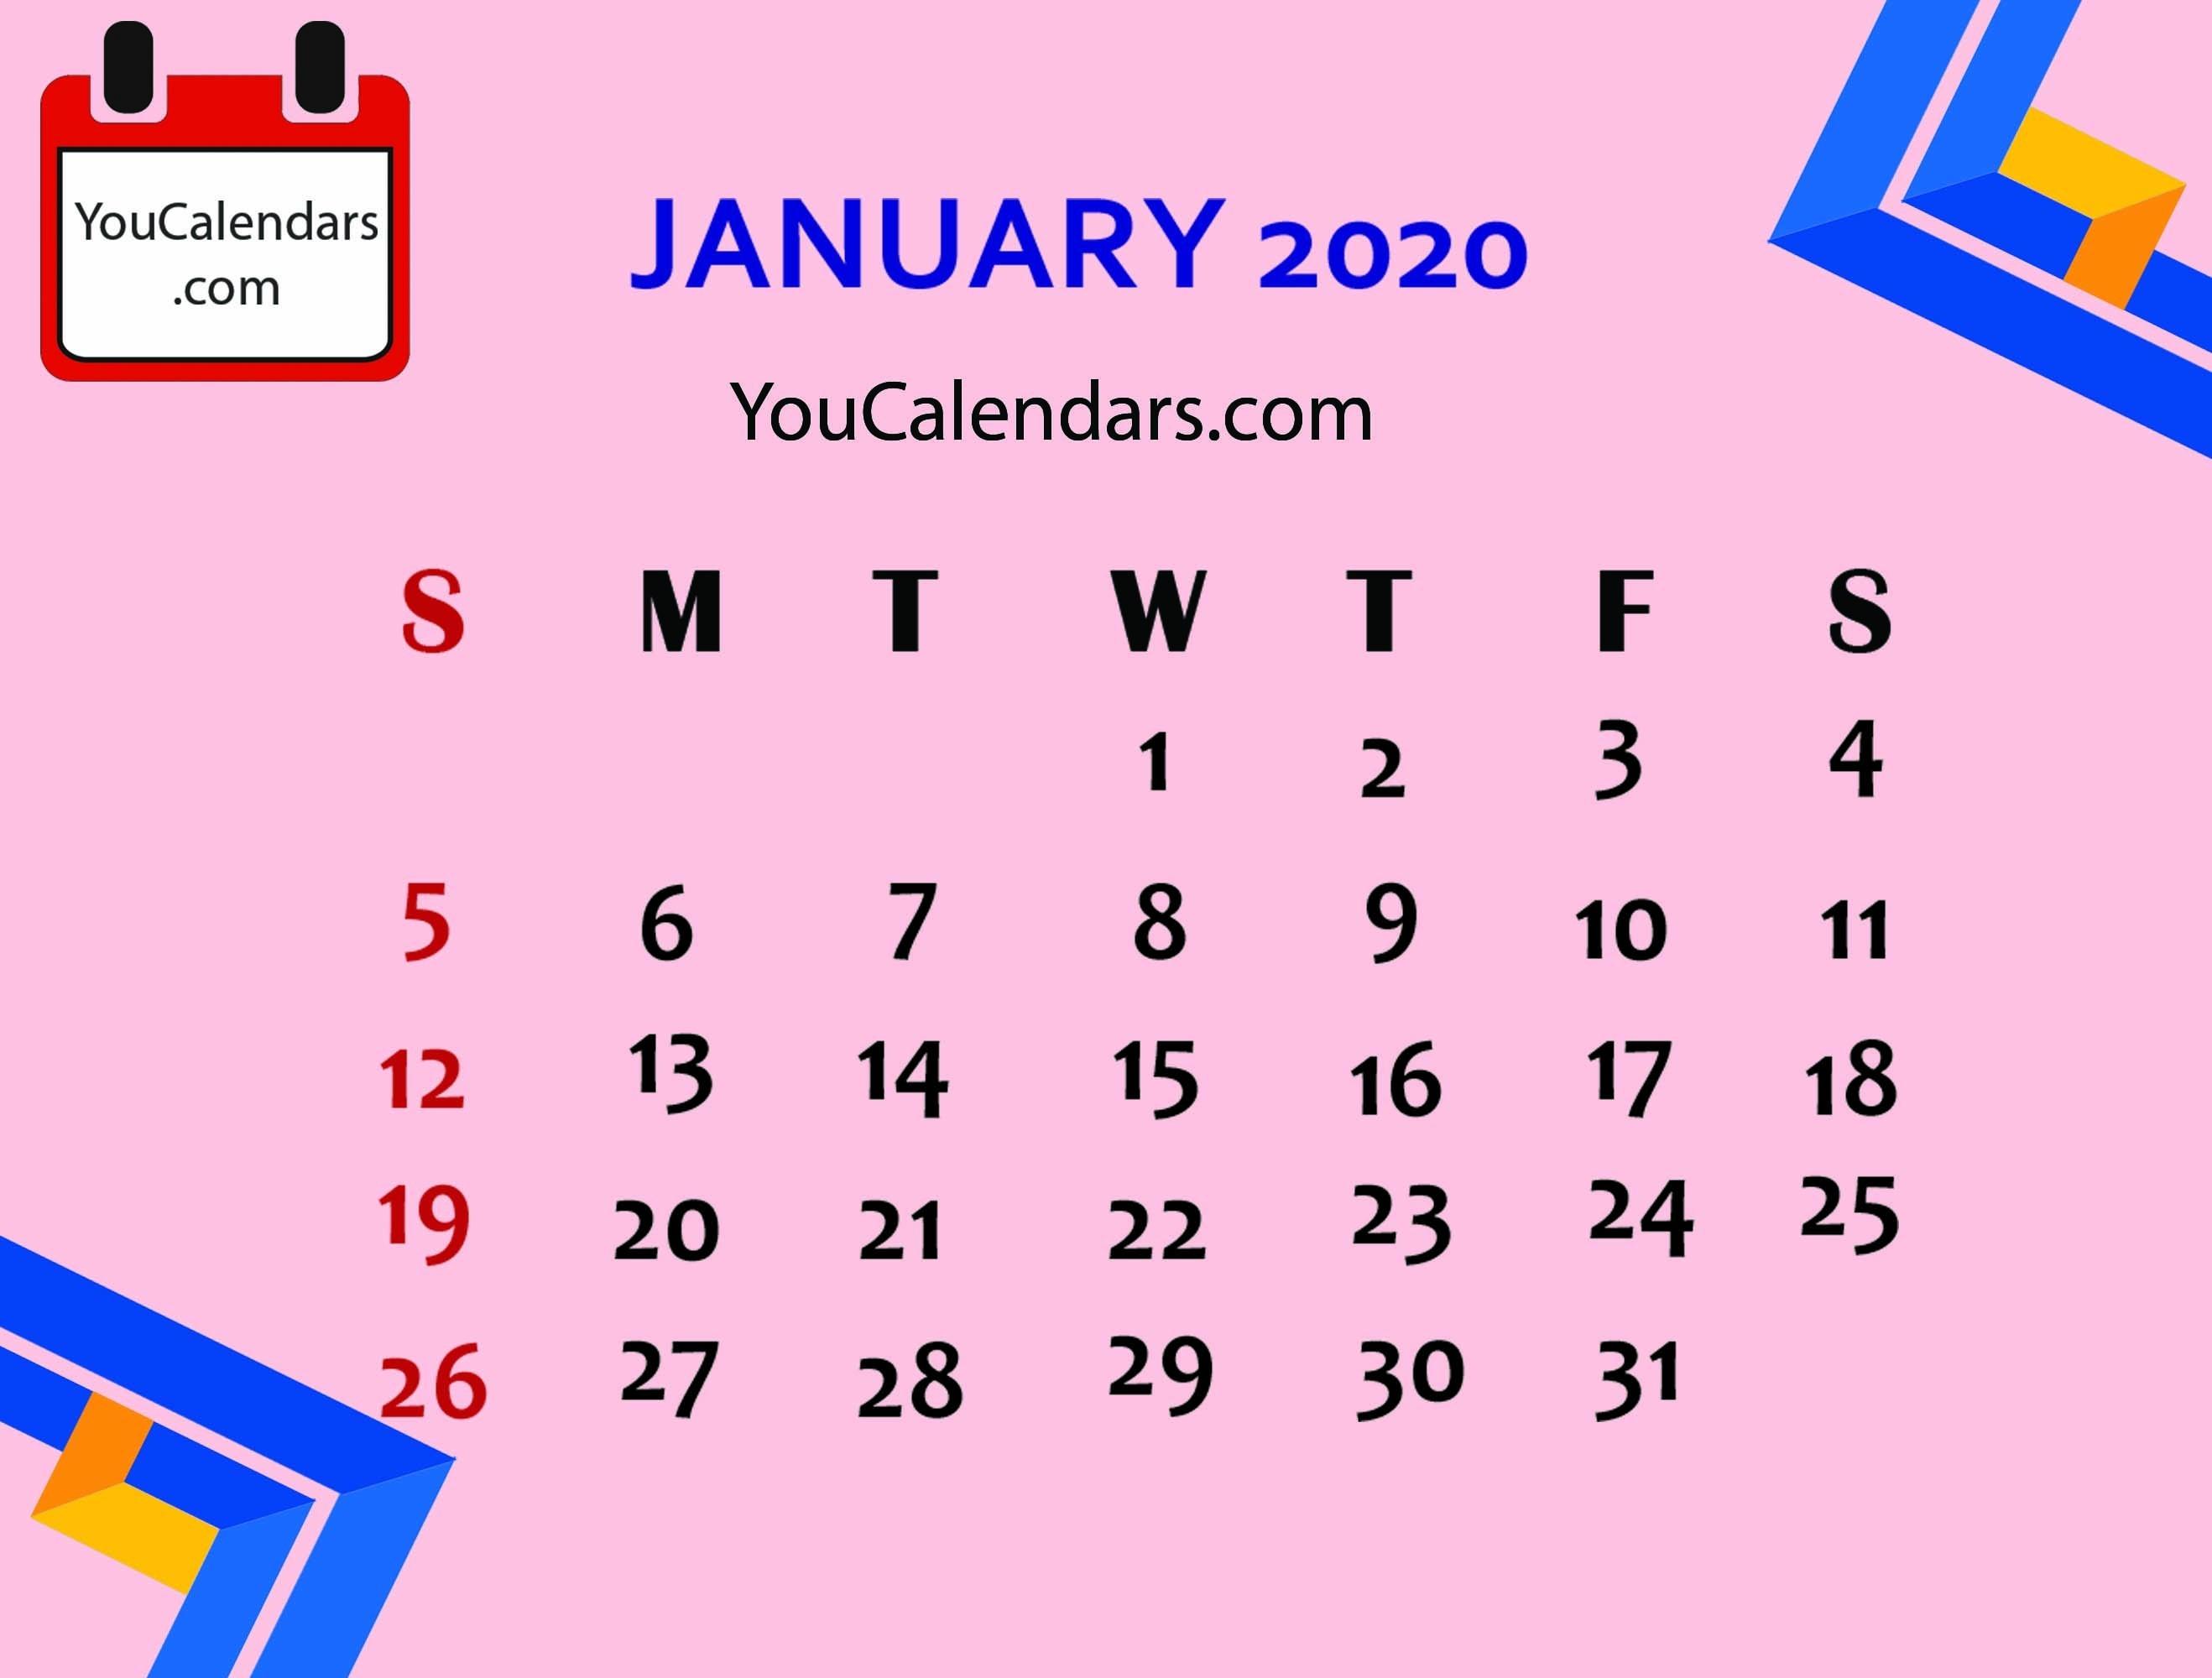 ✅Free January 2020 Calendar Printable Template - You Calendars-January 2020 Calendar Vertical